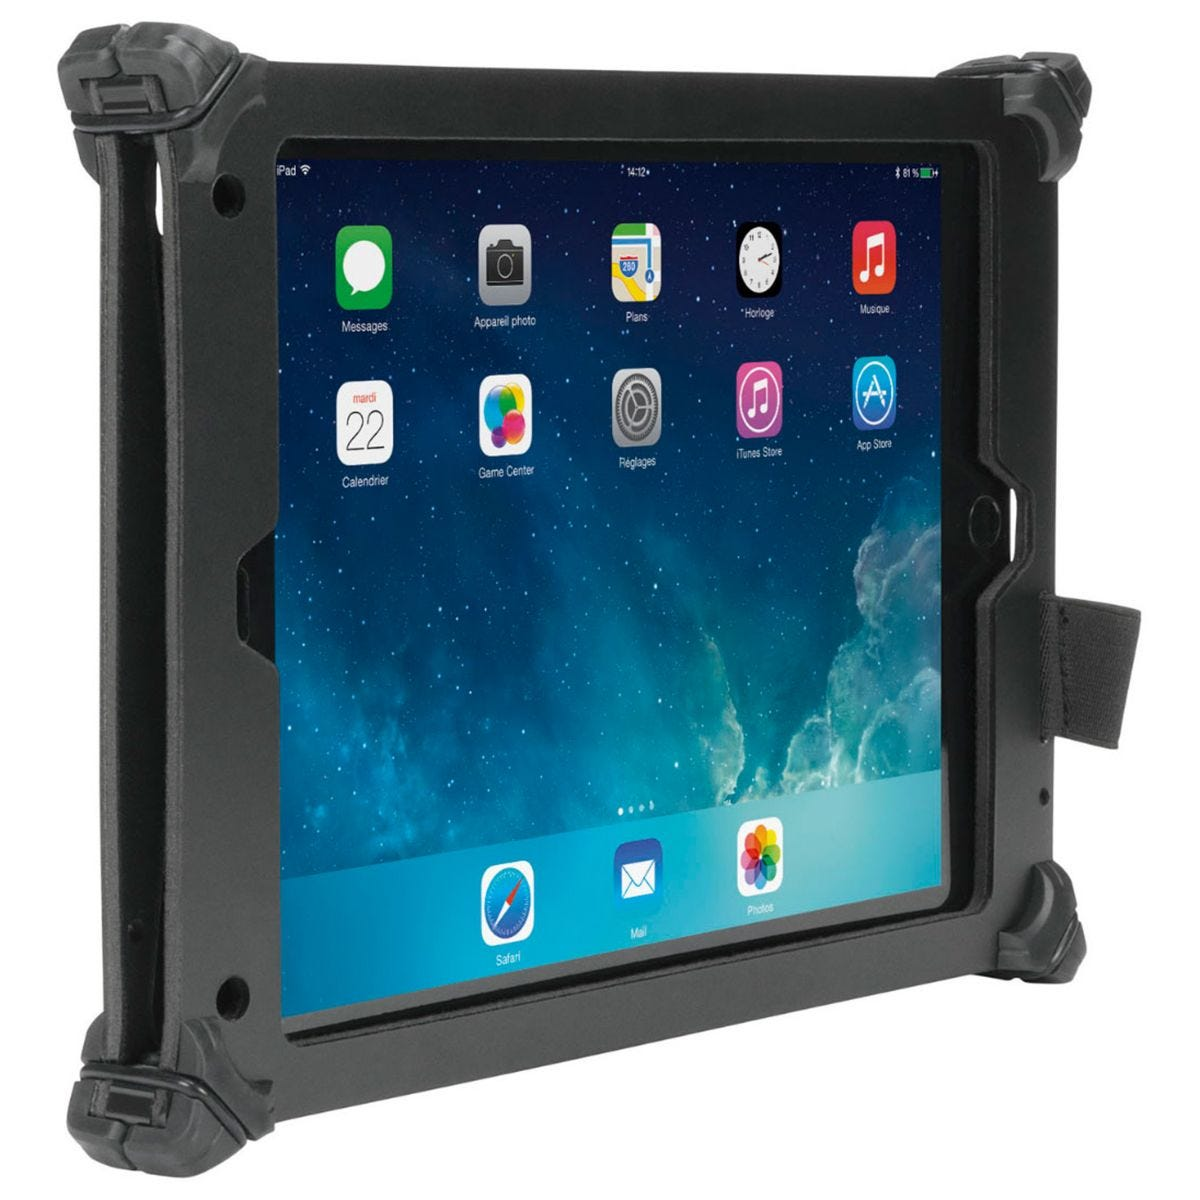 Mobilis RESIST Case for iPad 2018/2017/Air 2/Air - Black